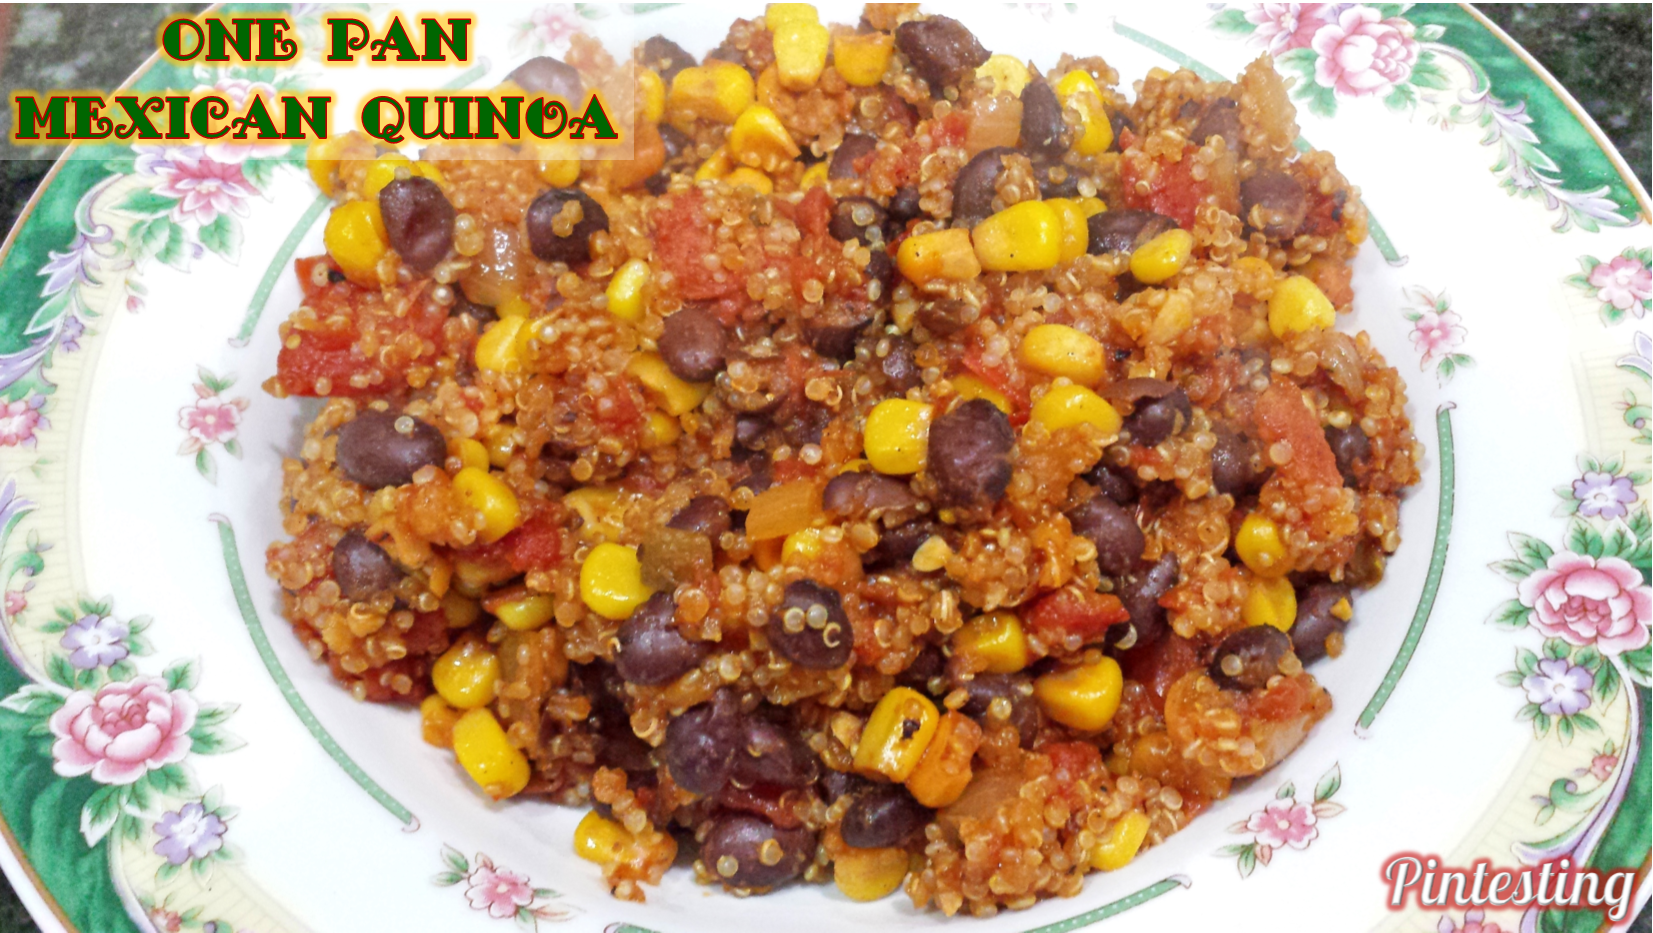 Pintesting One Pan Mexican Quinoa